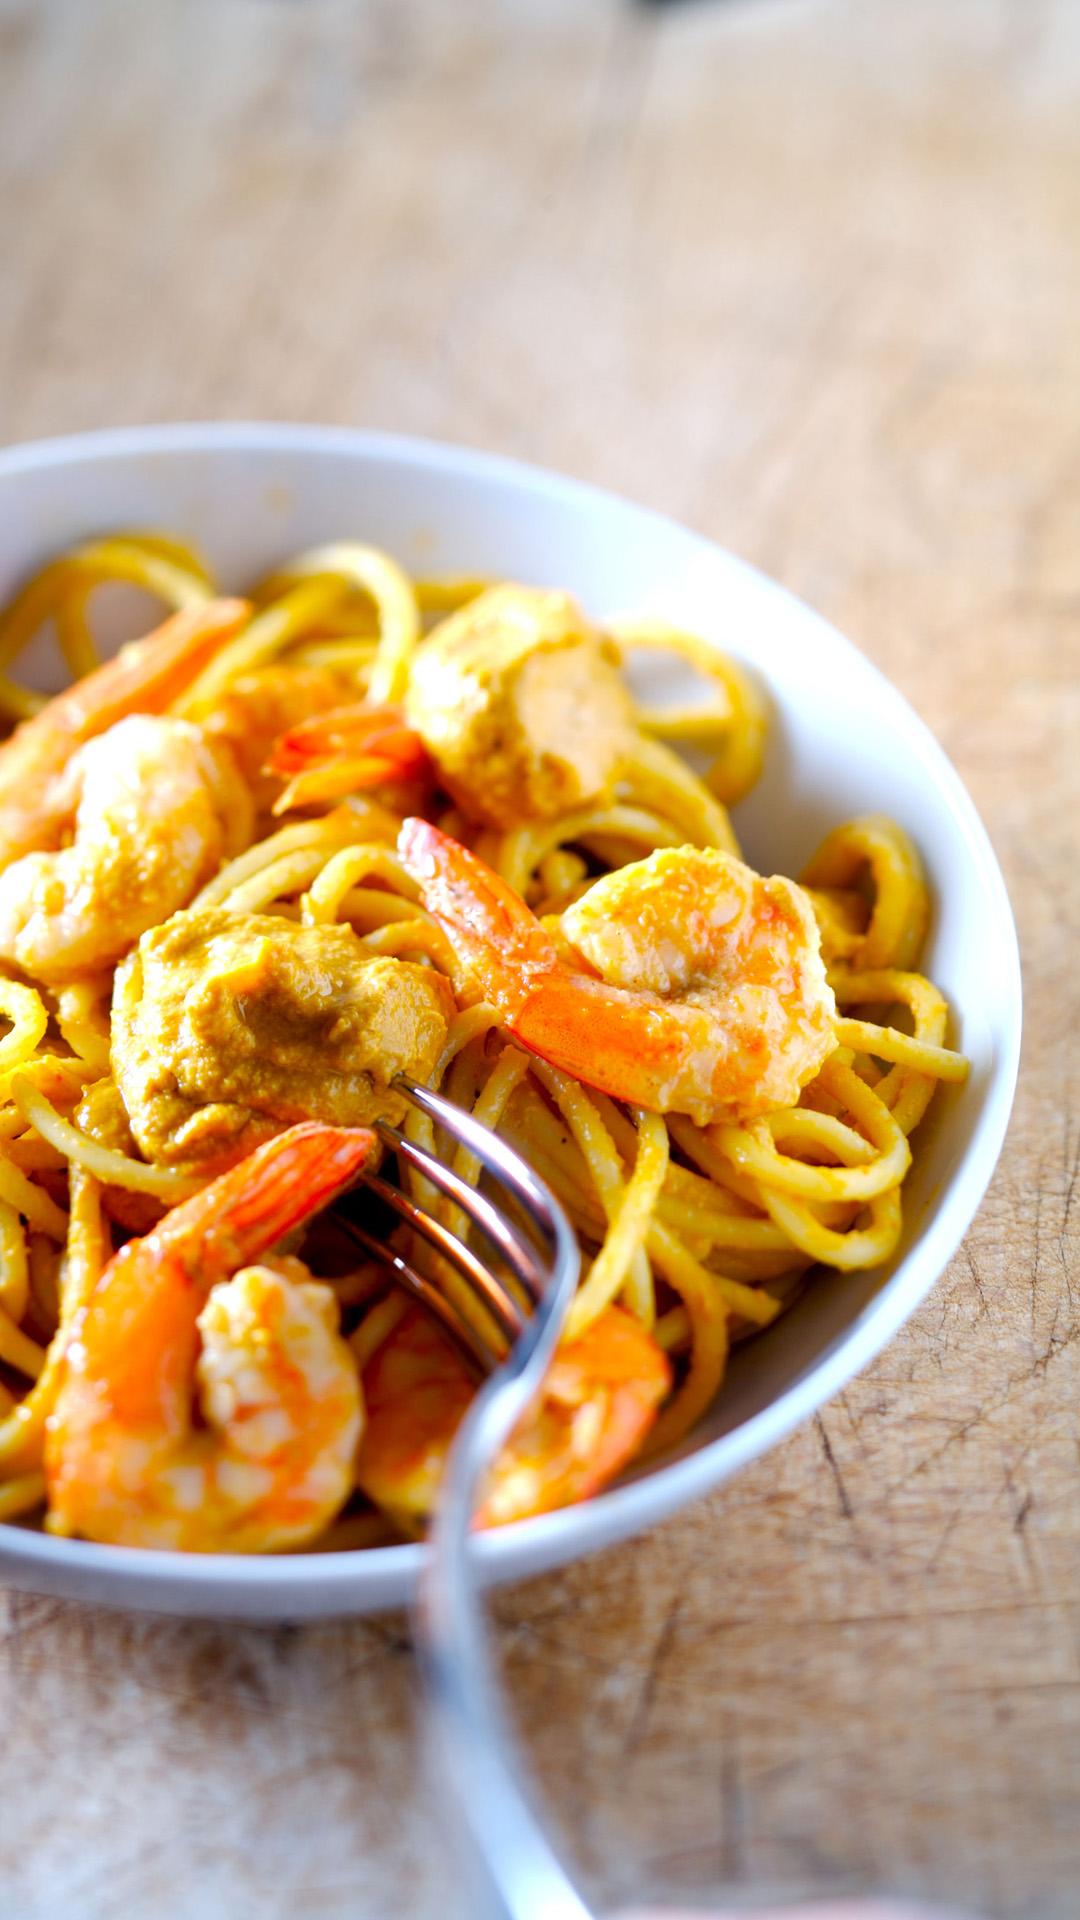 Seafood spaghetti htc one wallpaper